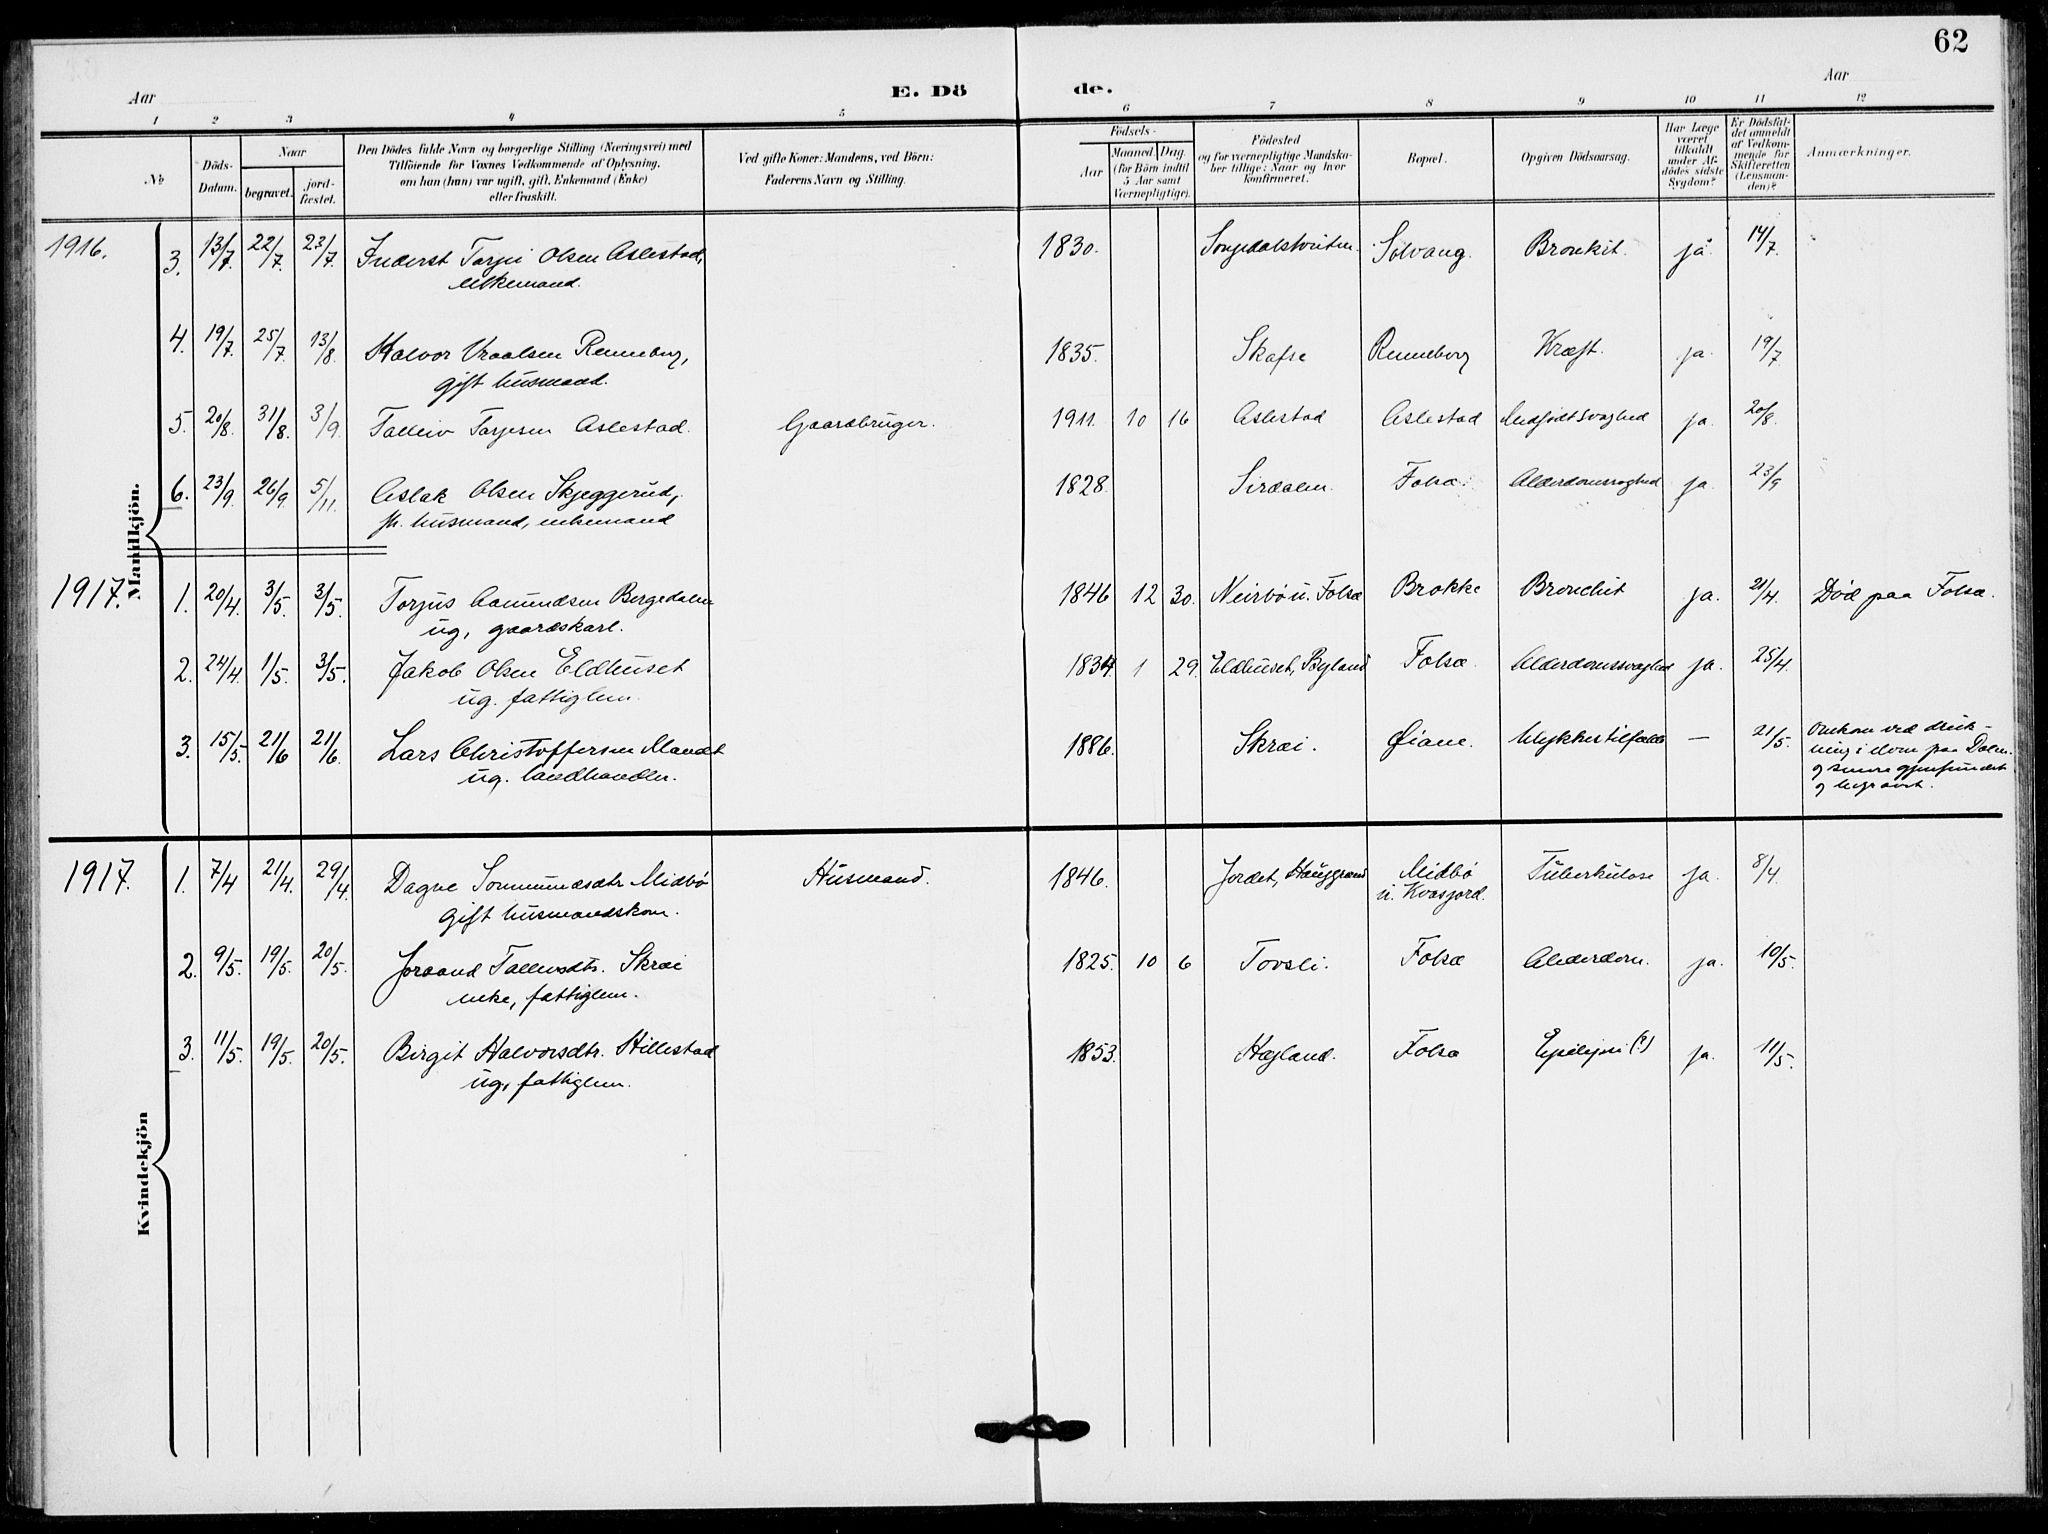 SAKO, Fyresdal kirkebøker, F/Fb/L0004: Ministerialbok nr. II 4, 1903-1920, s. 62